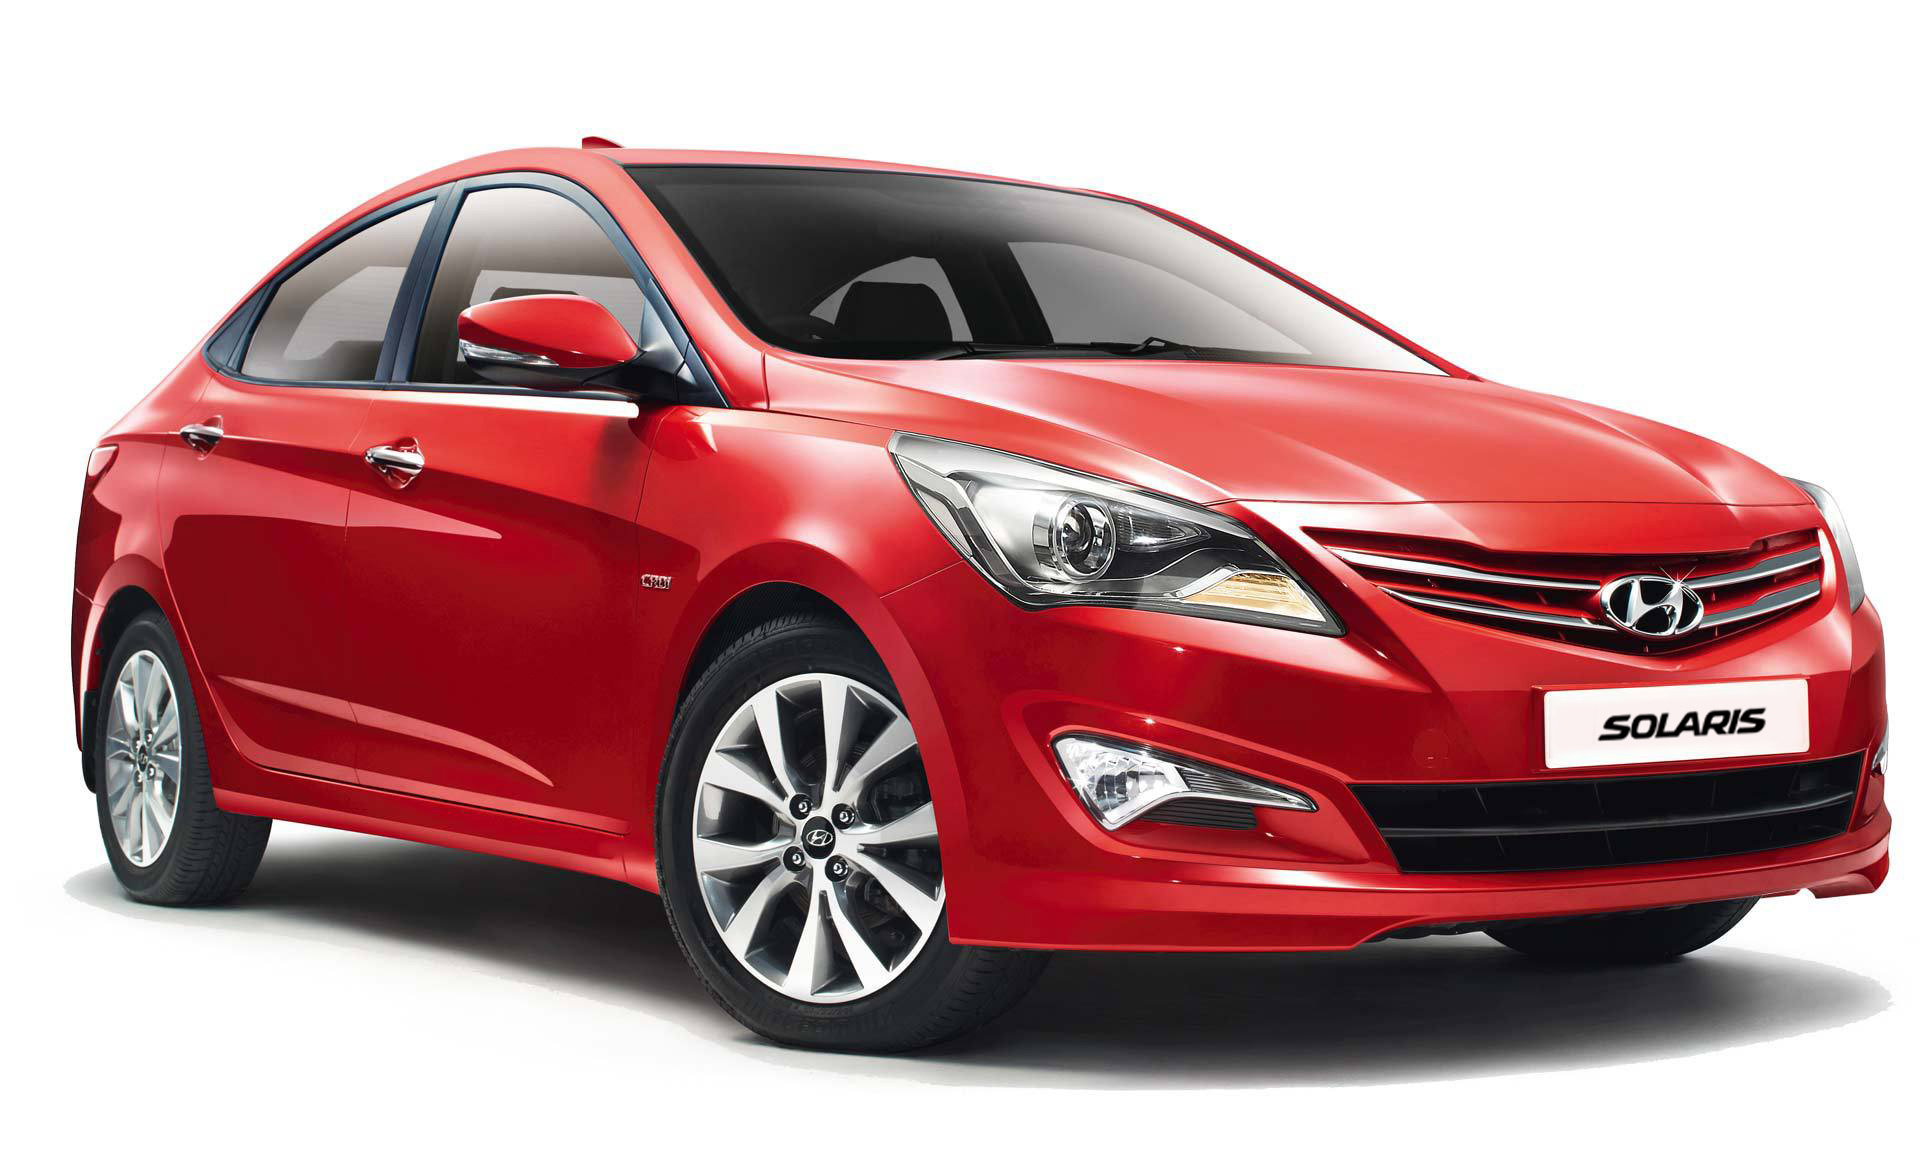 Hyundai Getz New Car Price In India